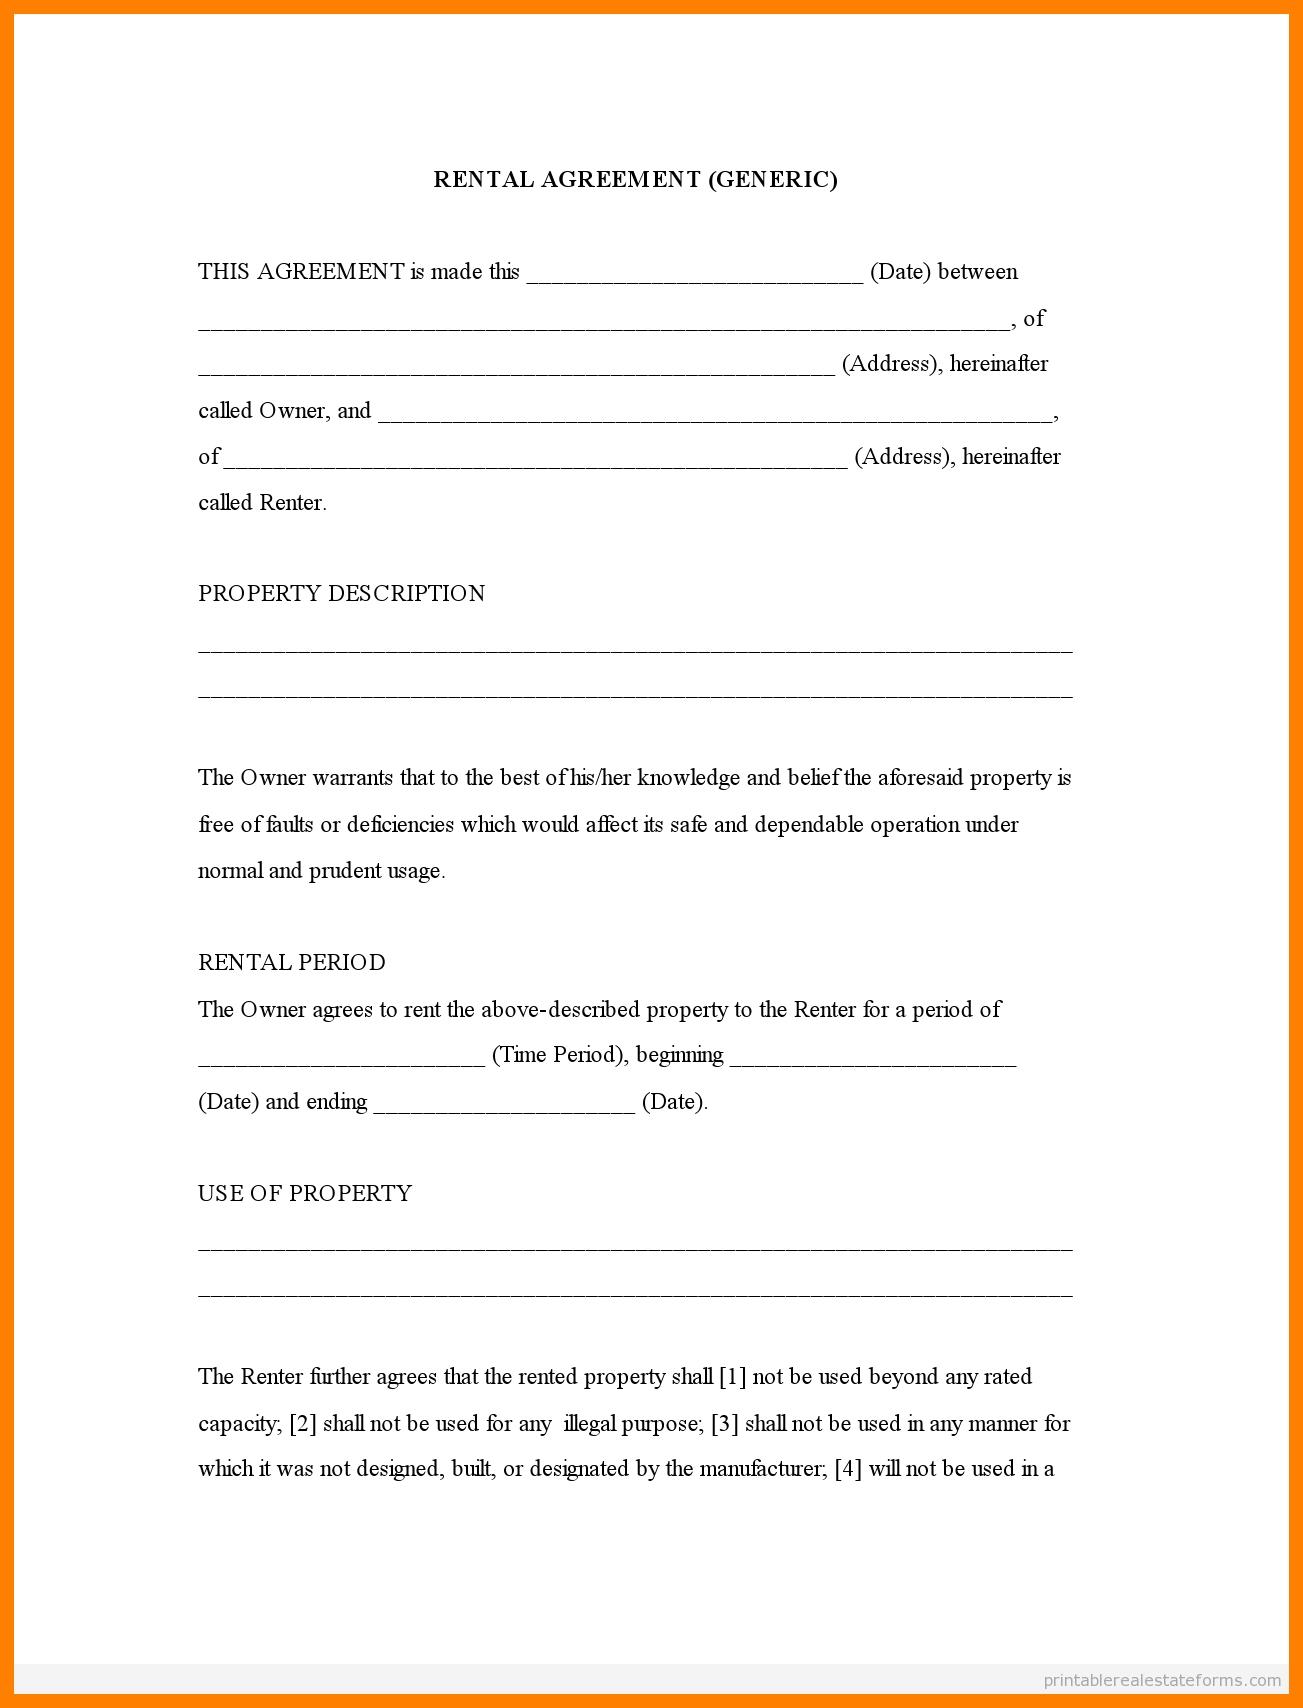 Free Printable Rental Agreement Forms   Bestprintable231118 - Rental Agreement Forms Free Printable